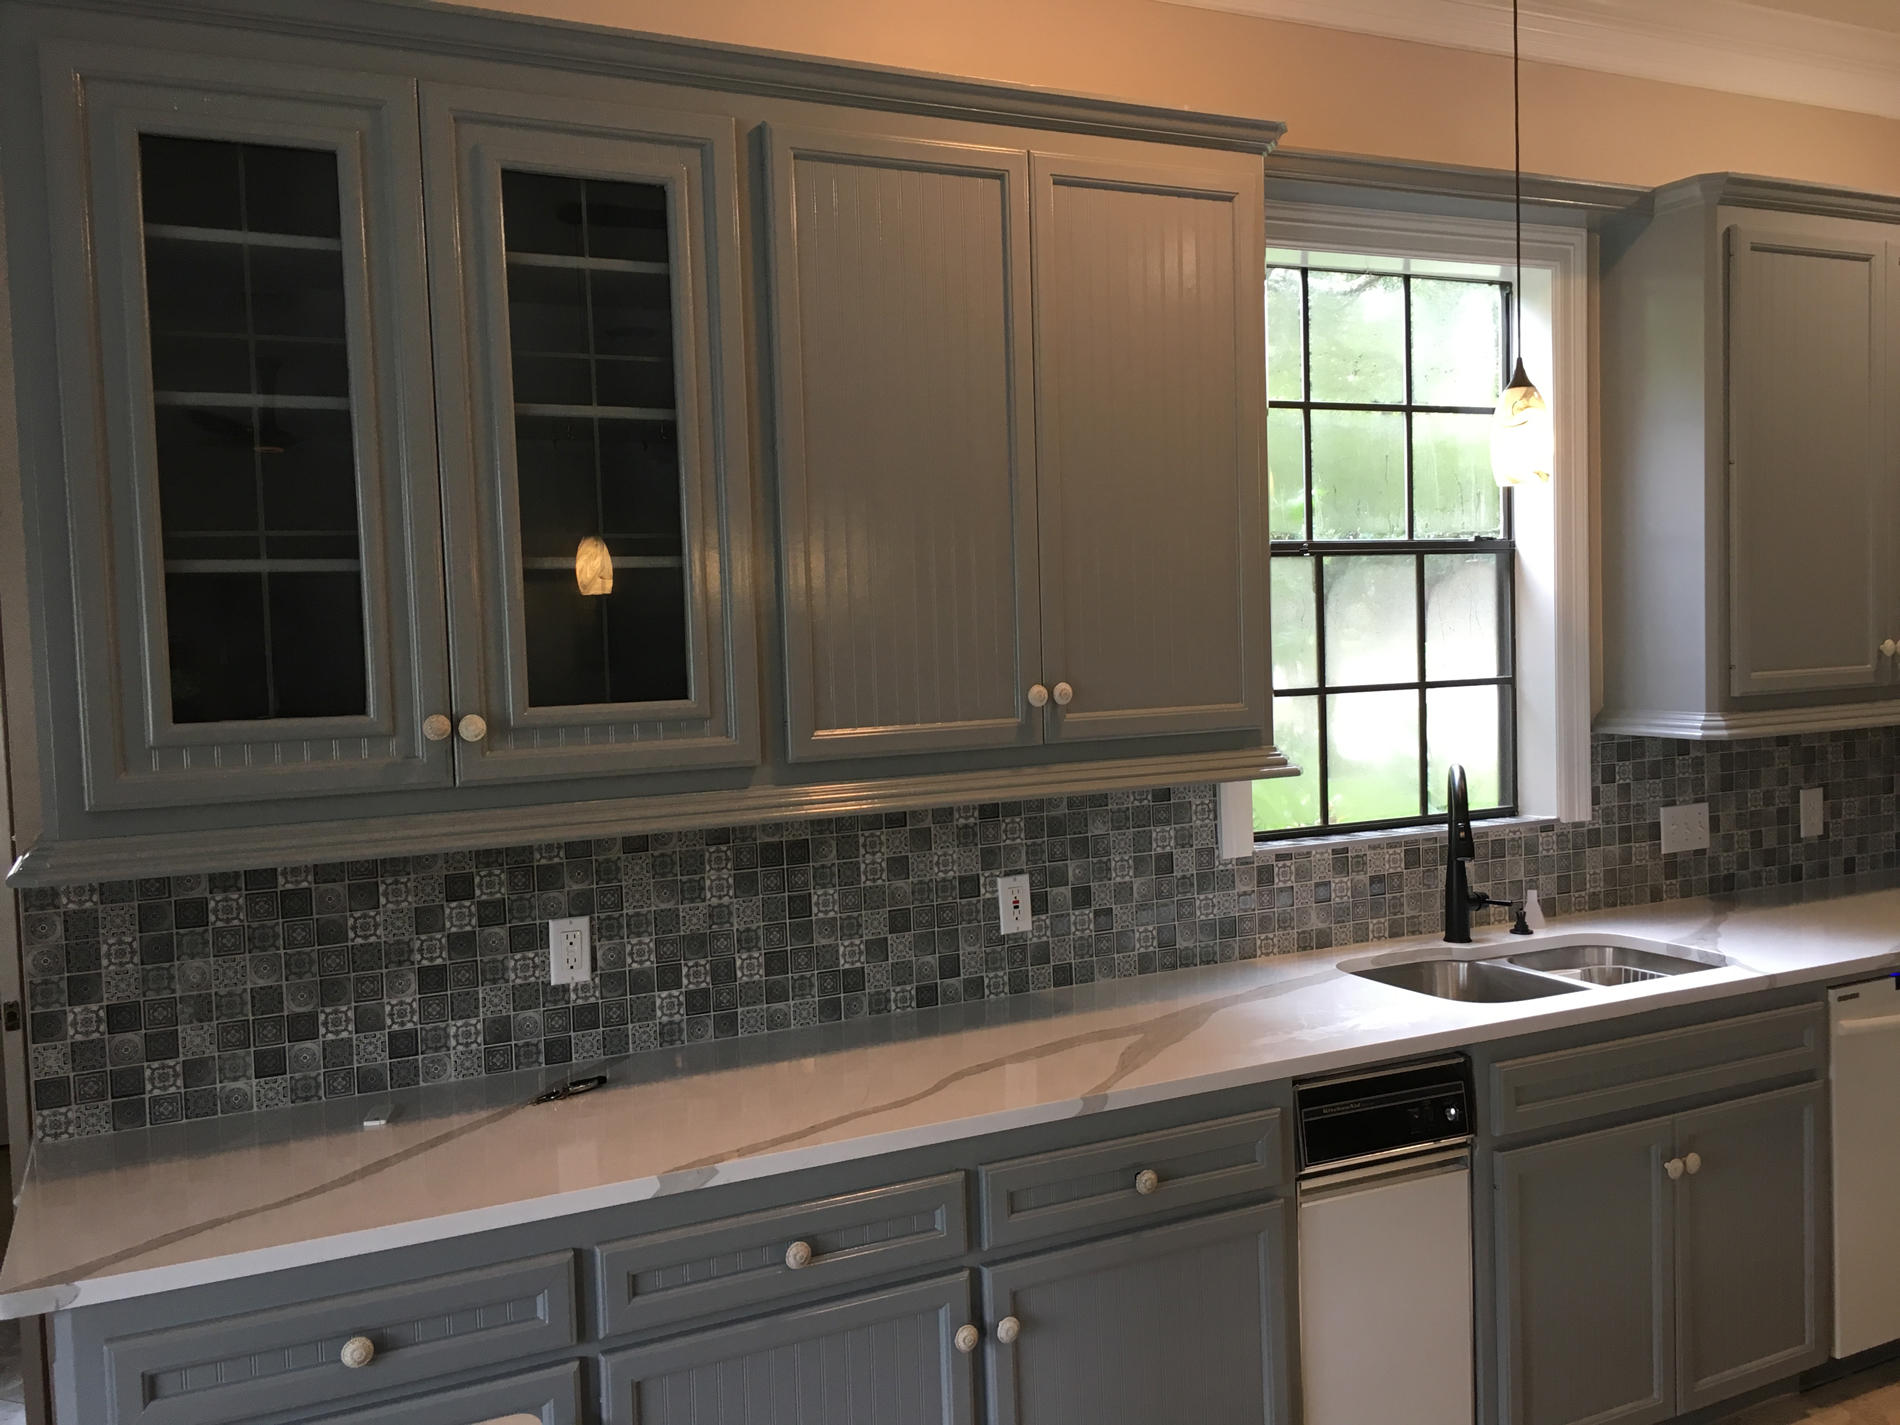 Artech design inc - DBA Floors Kitchen and Bath image 16